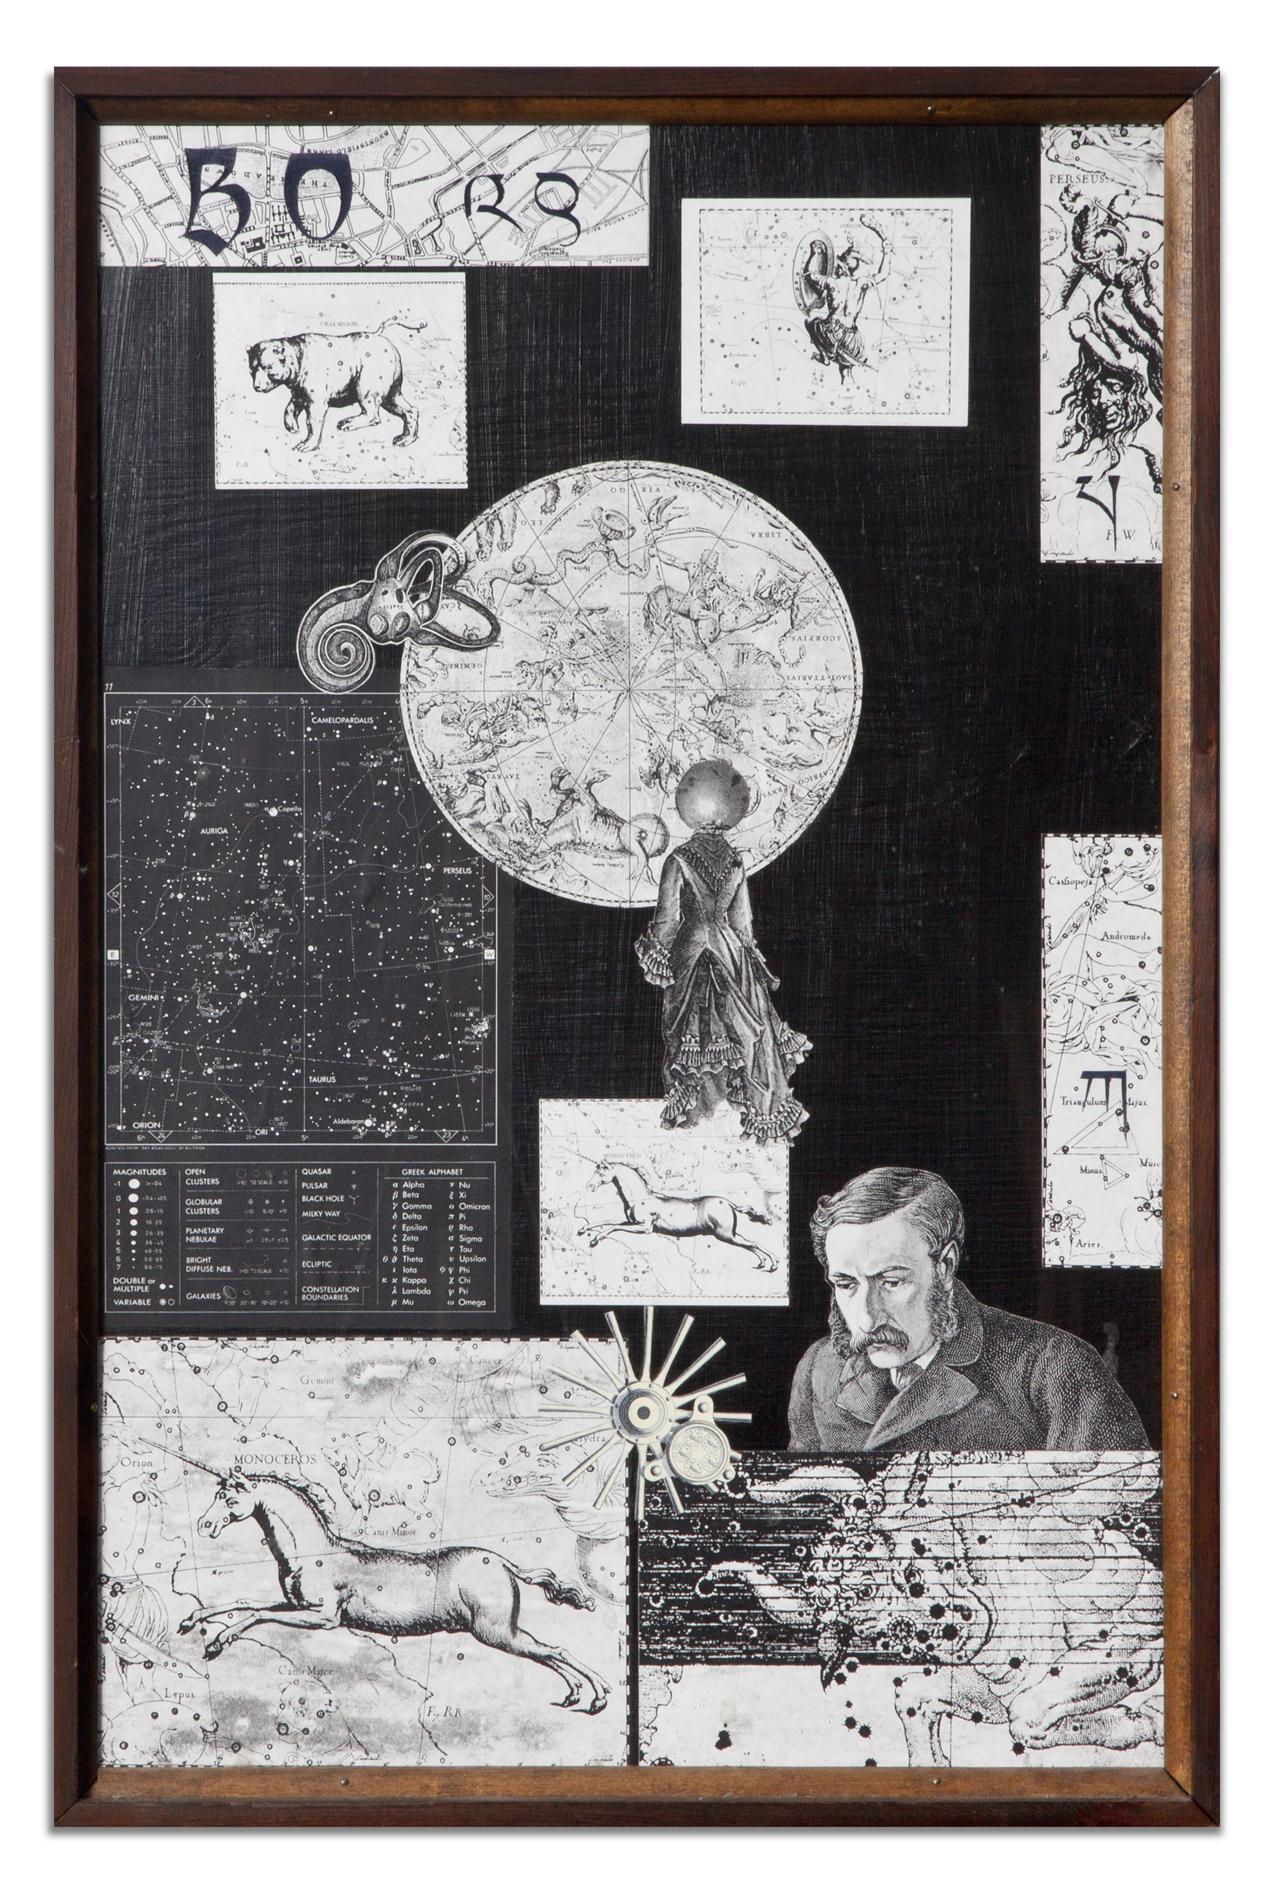 Lawrence Jordan, BULLETIN BOARD #2: LEGENDS OF THE STARS, 2000, collage black BG, 24 x 16 inches